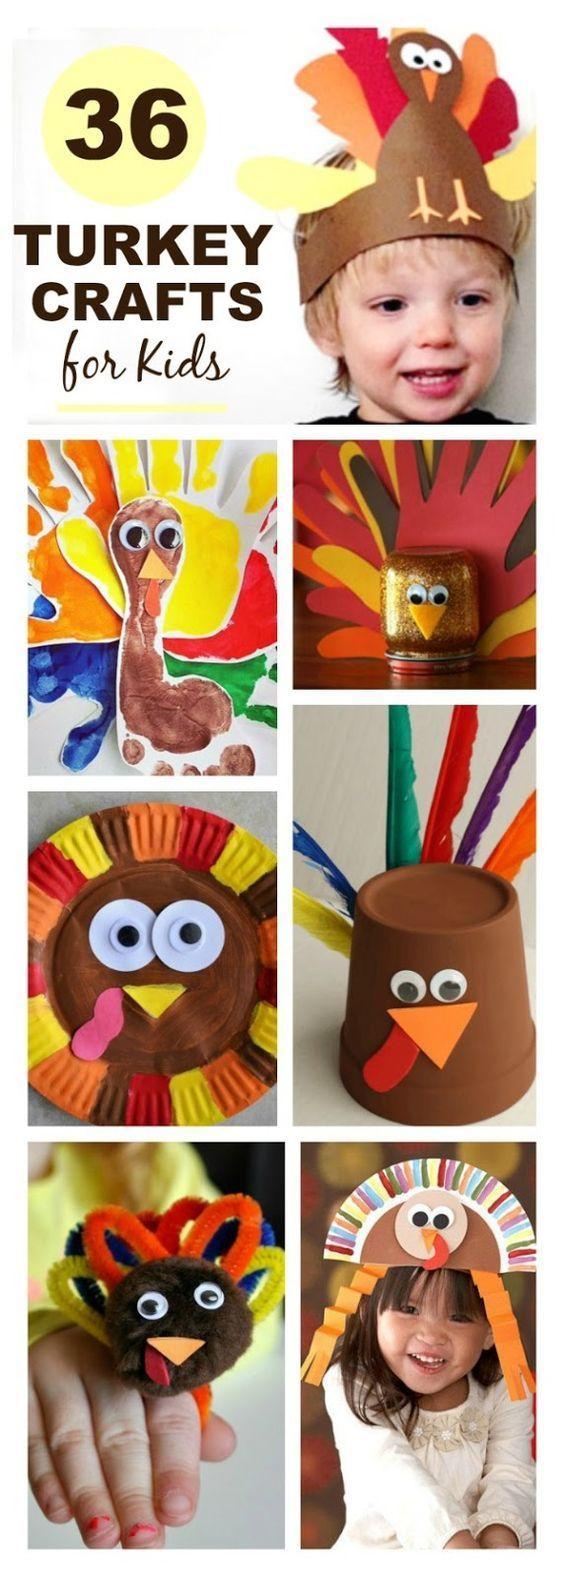 Best 25+ Thanksgiving kids crafts ideas on Pinterest   Thanksgiving crafts,  November crafts and Thanksgiving crafts for kids